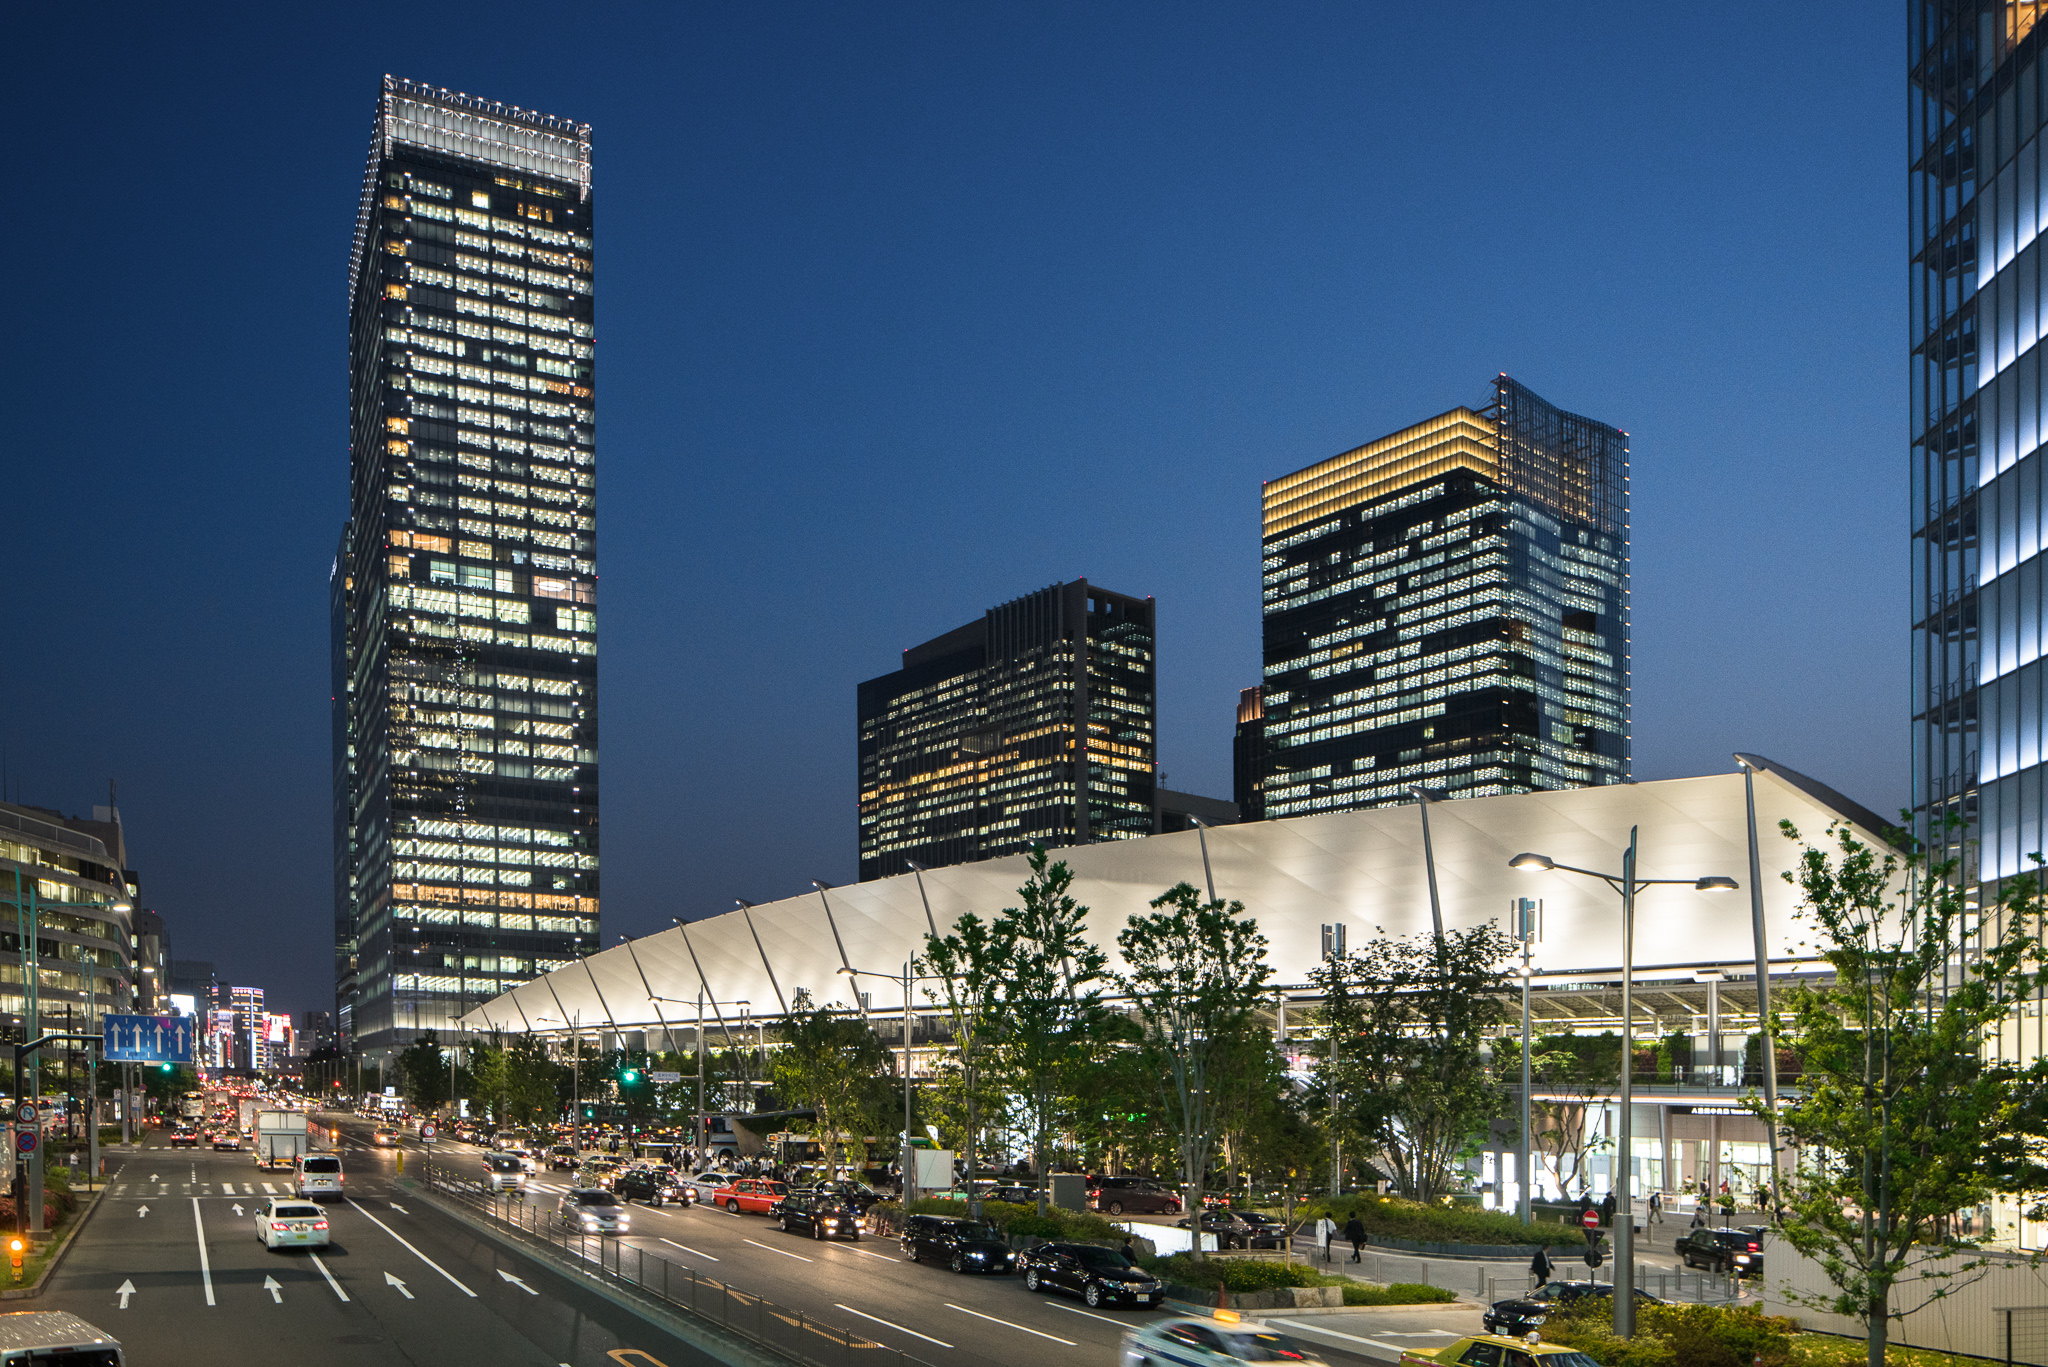 Copy of Copy of Copy of Tokyo Station - Yaesu Redevelopment